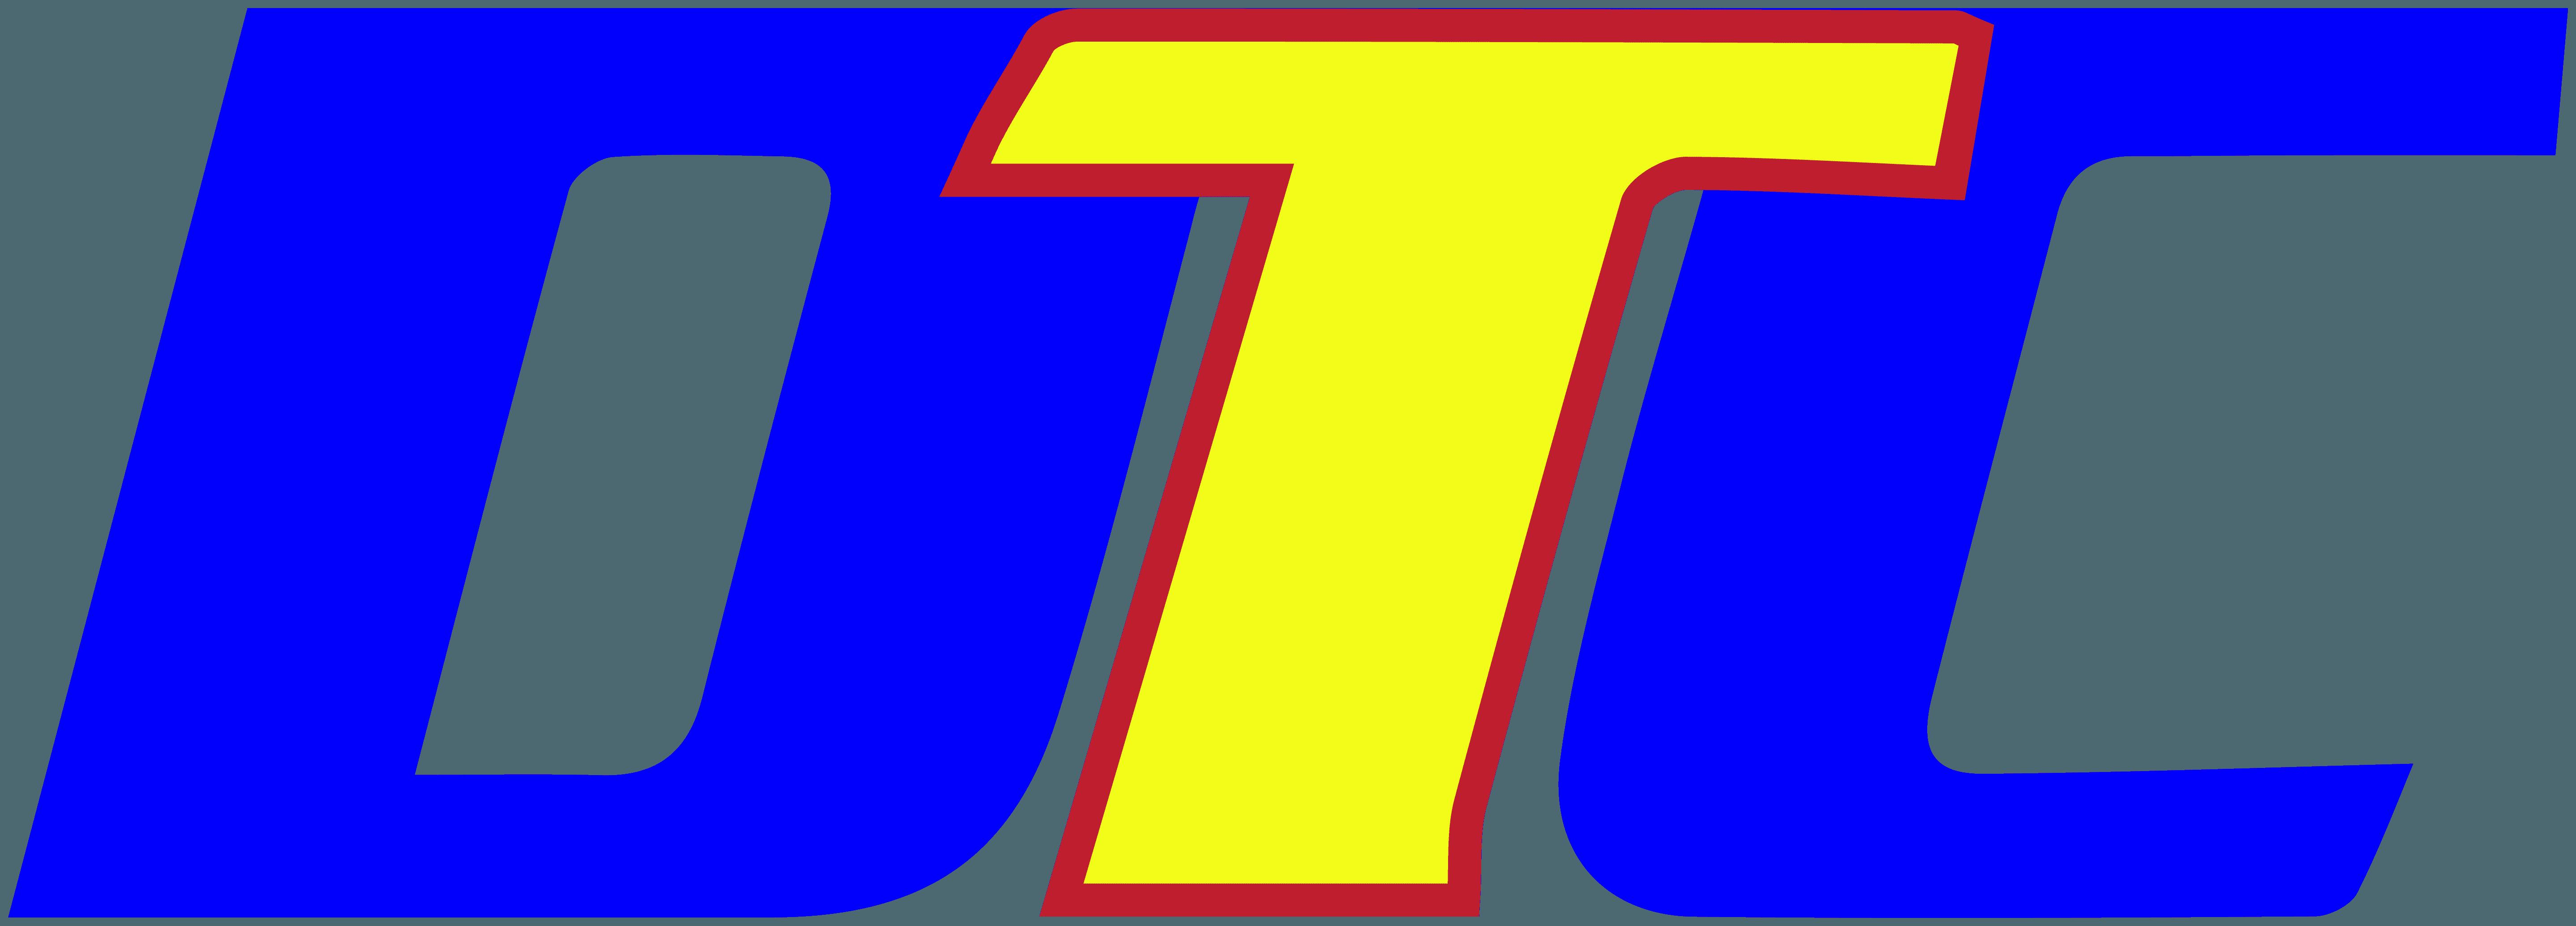 dubbo traffic control logo